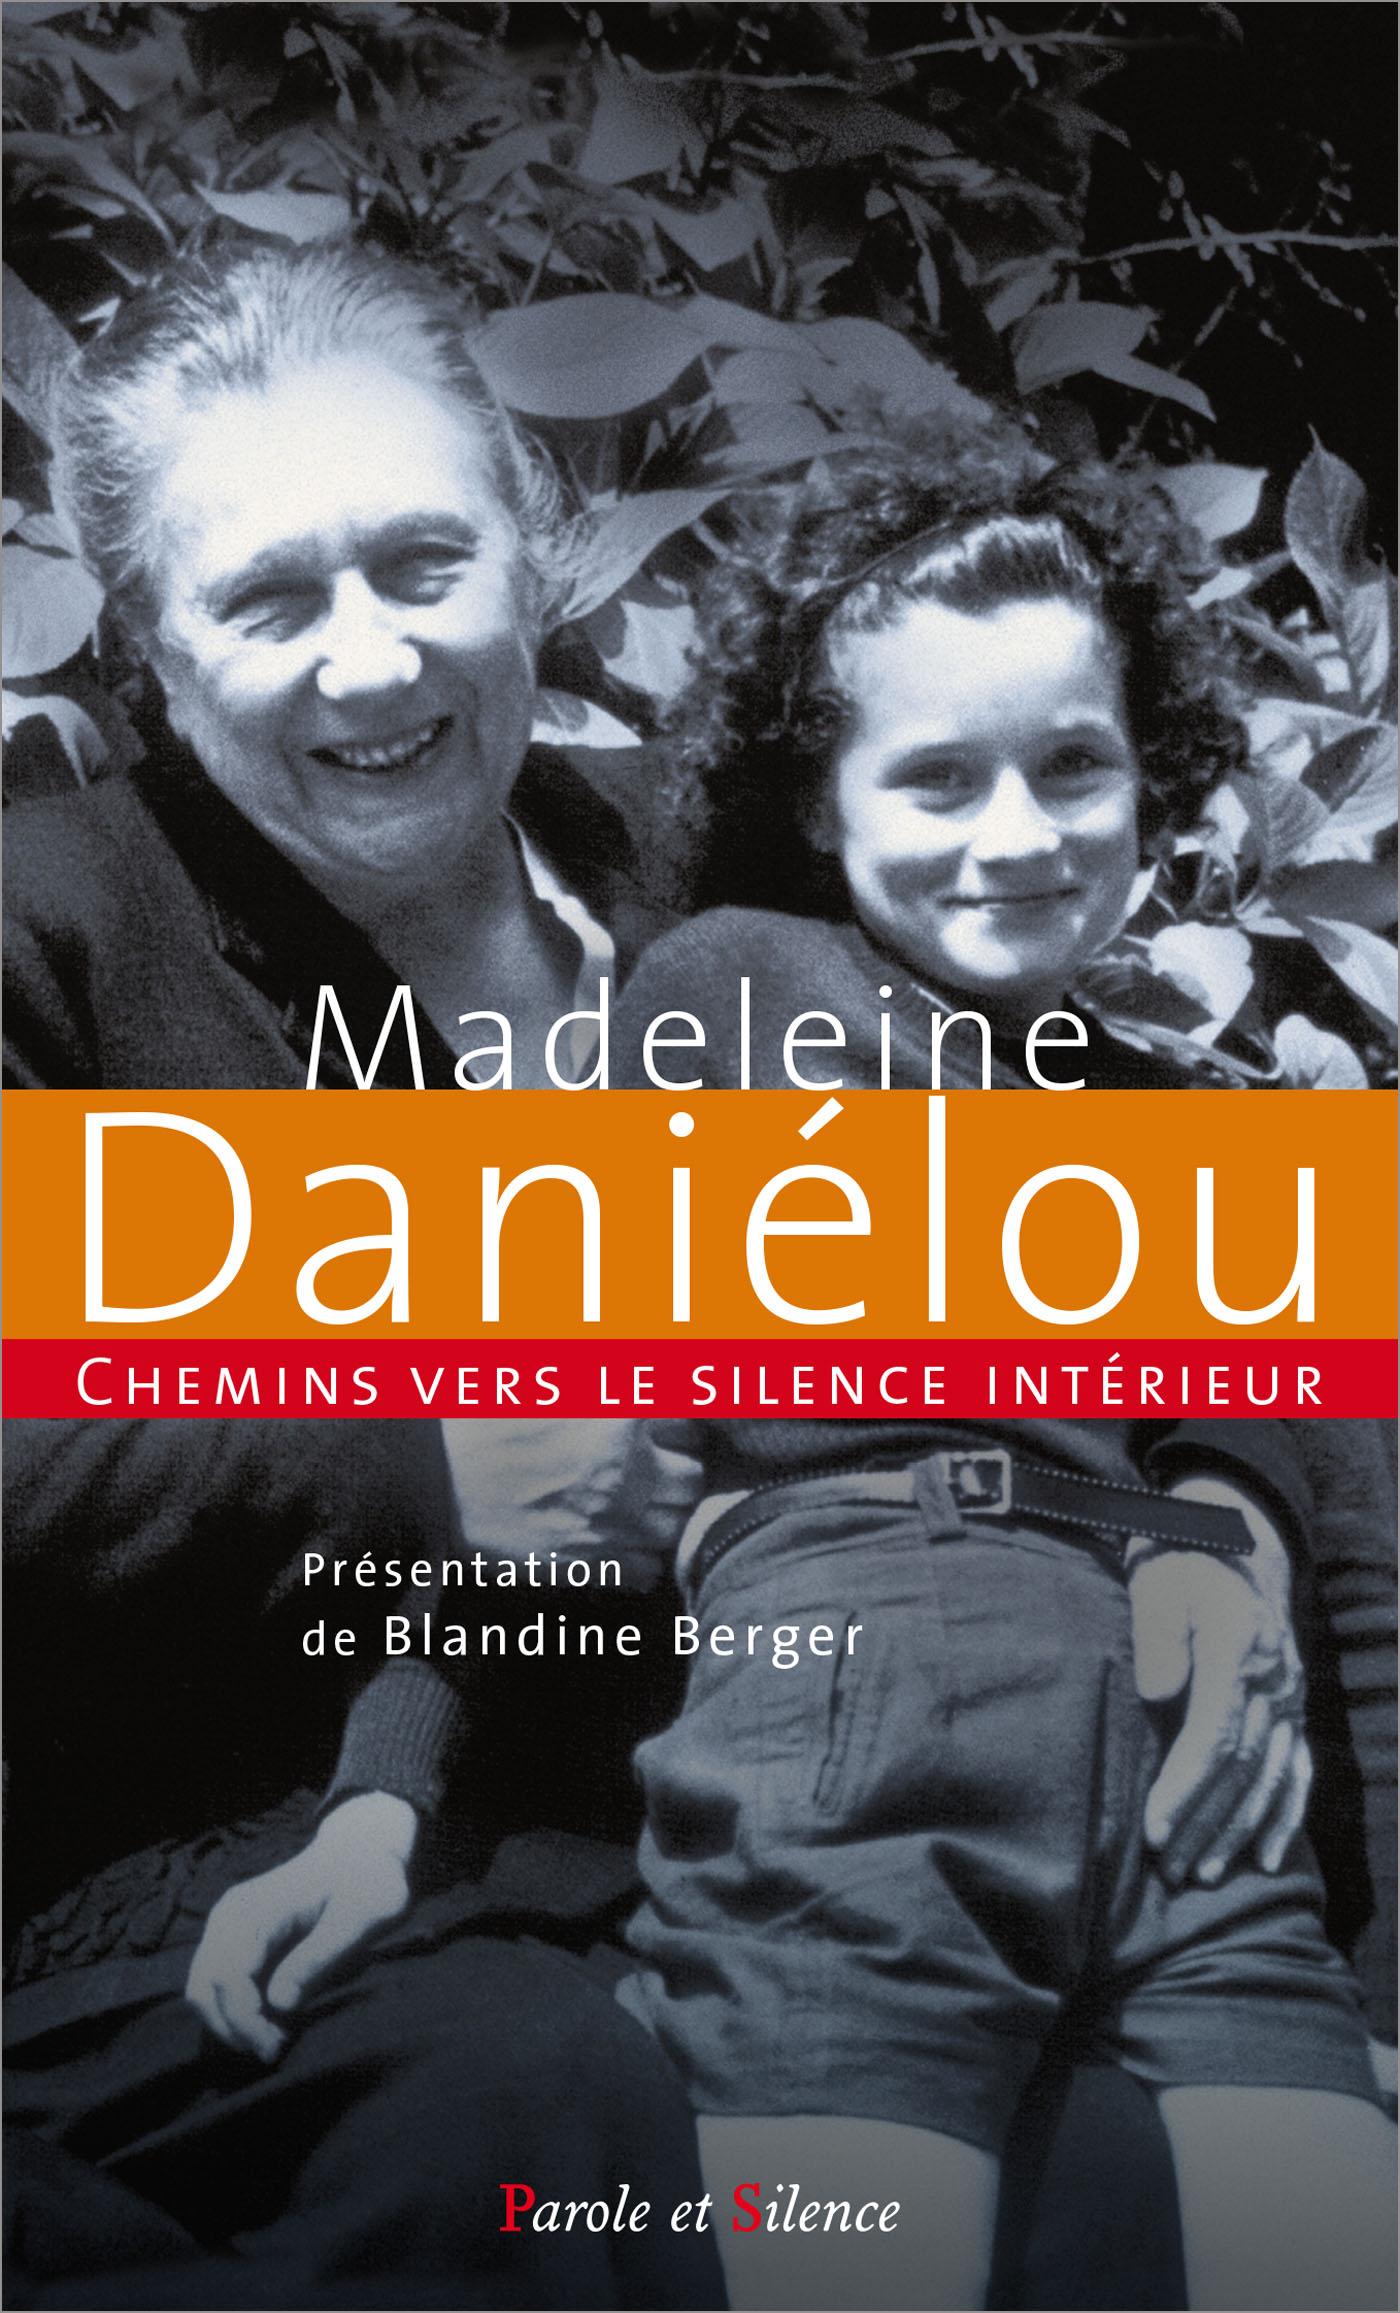 Chemins vers le silence intérieur avec Madeleine Daniélou